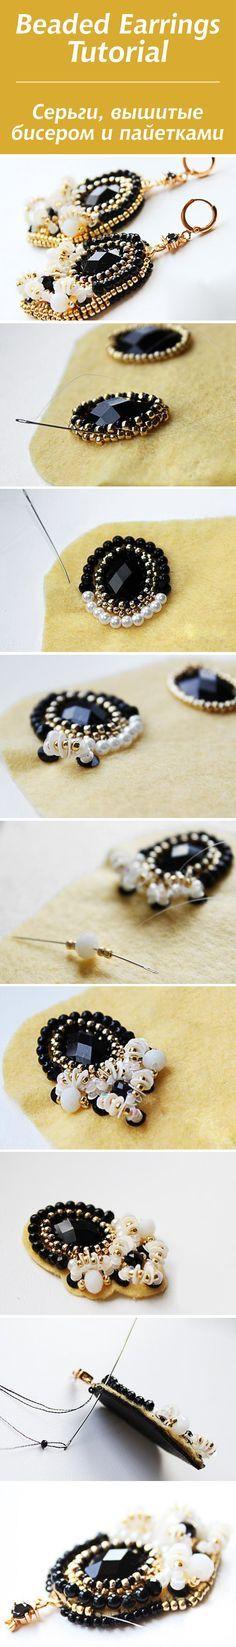 Beaded Earrings Tutorial / Вышитые бисером и пайетками серьги #beadwork